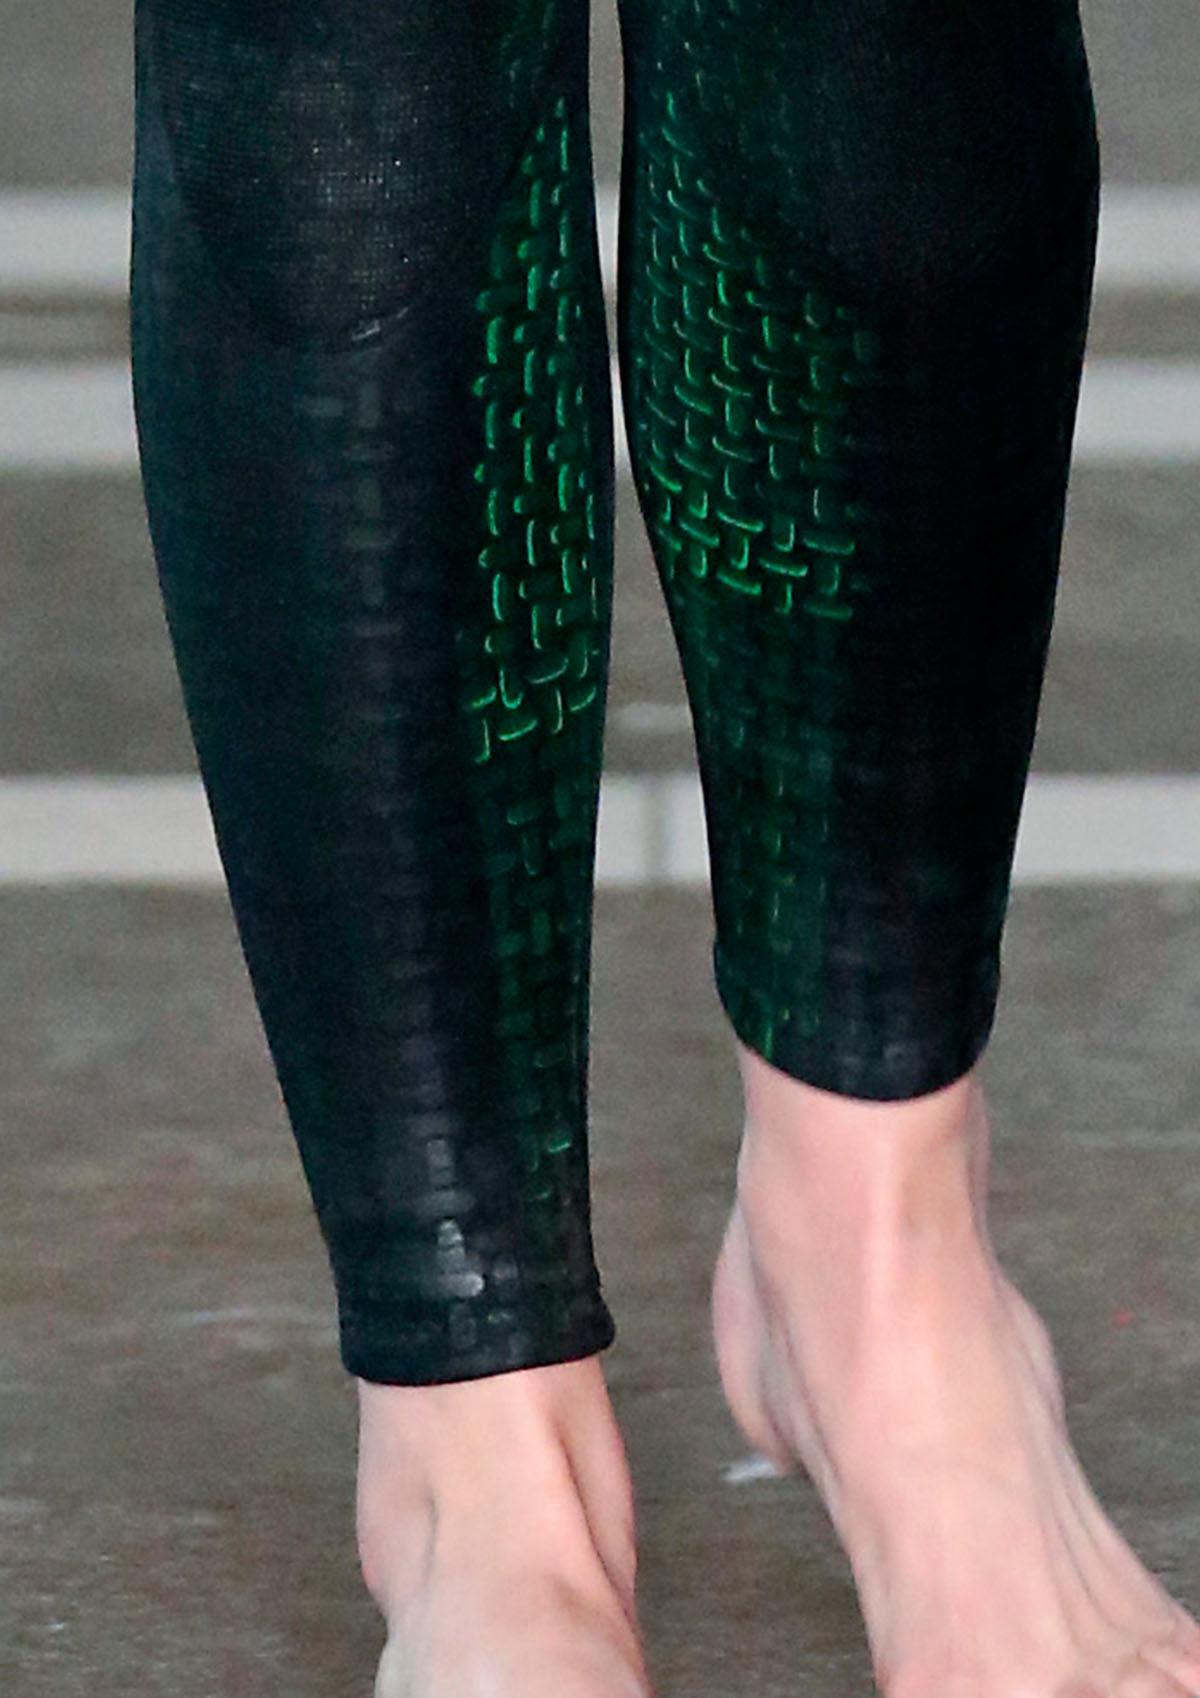 legss